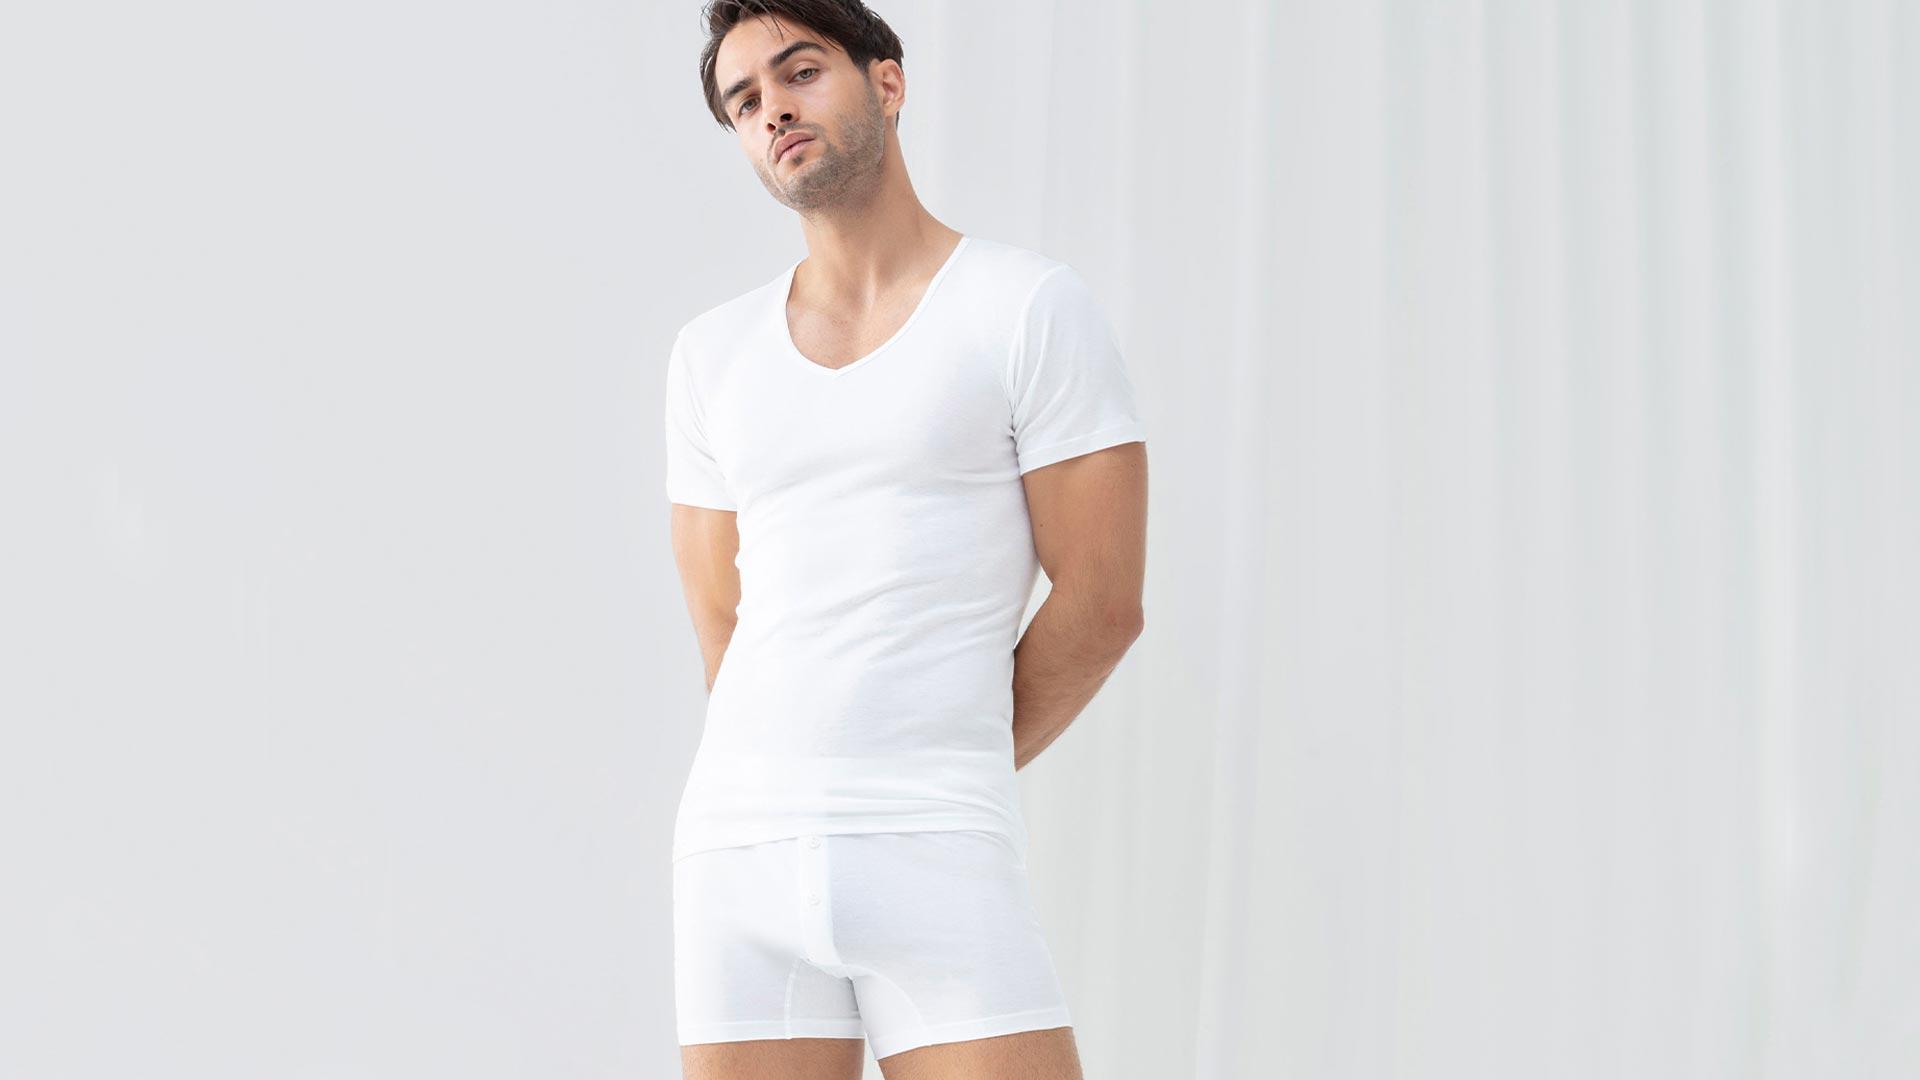 Funktionale, innovative Kurzarm-Shirts | mey®